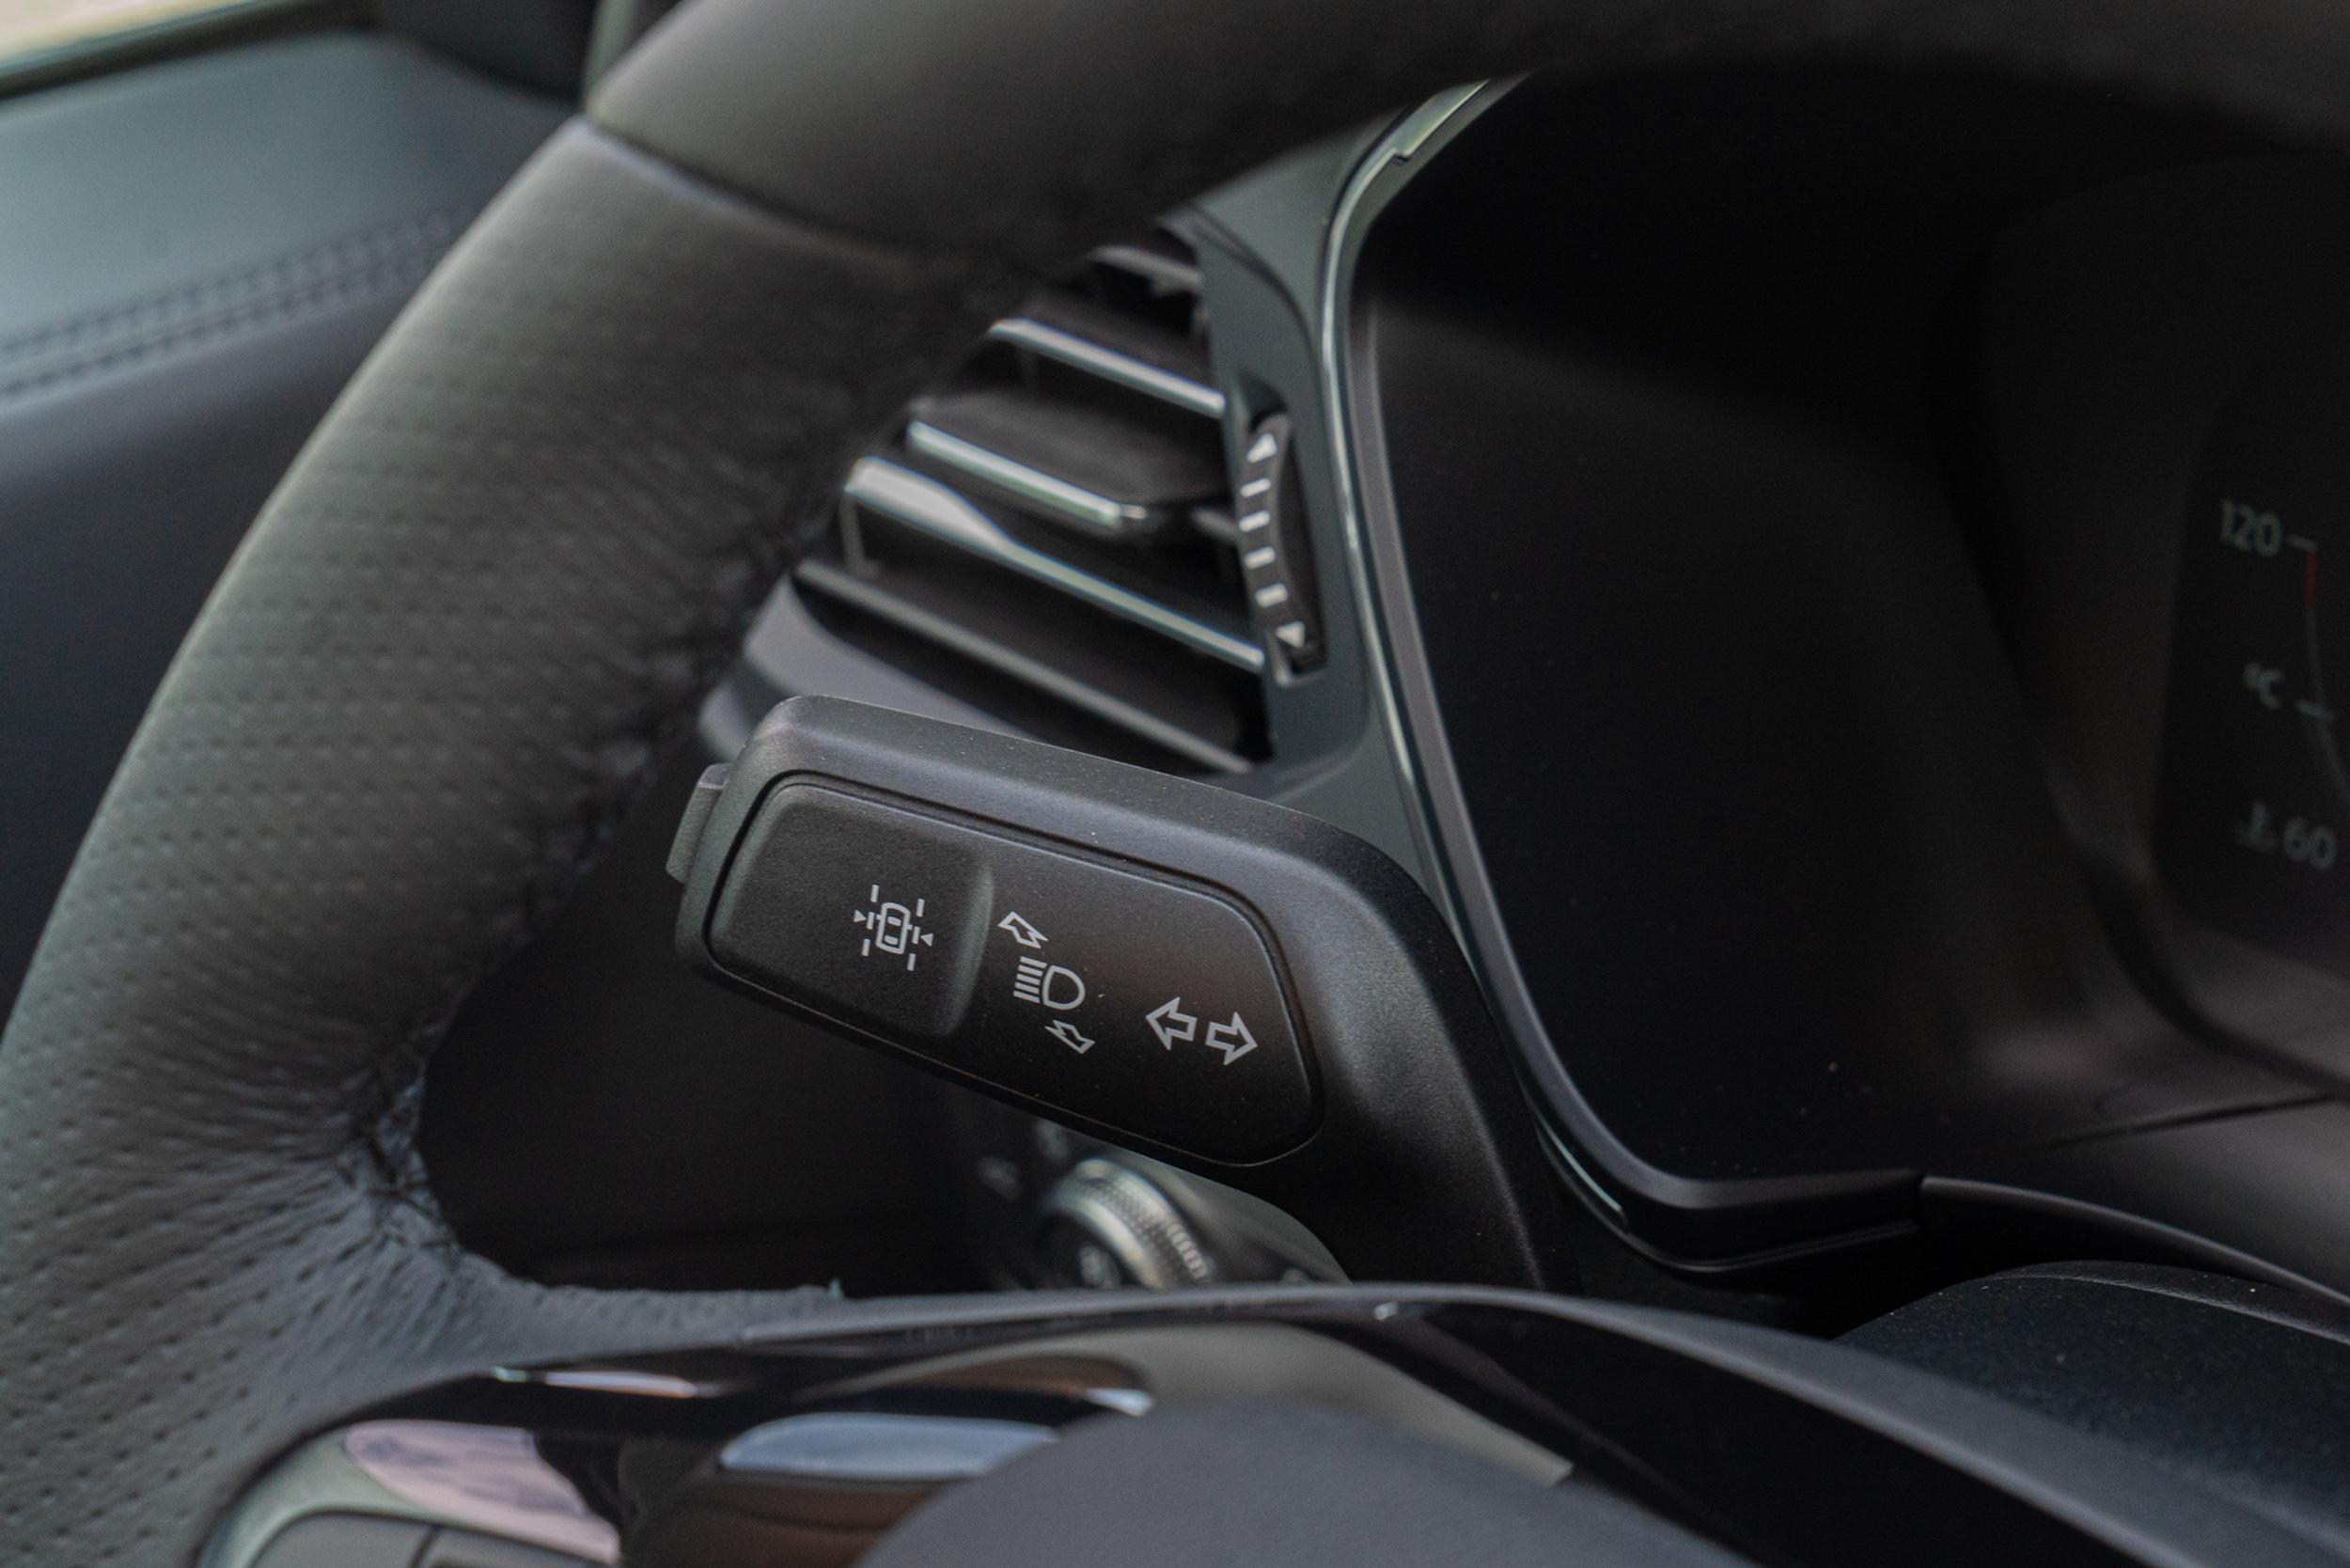 Kuga 21.5 年式 X Level 2 駕駛輔助科技再升級,導入歐洲 RED 道路邊緣偵測系統,強化整合 LDW、LKA 功能,於無標線道路邊緣偵測並提供車道偏移警示與輔助。